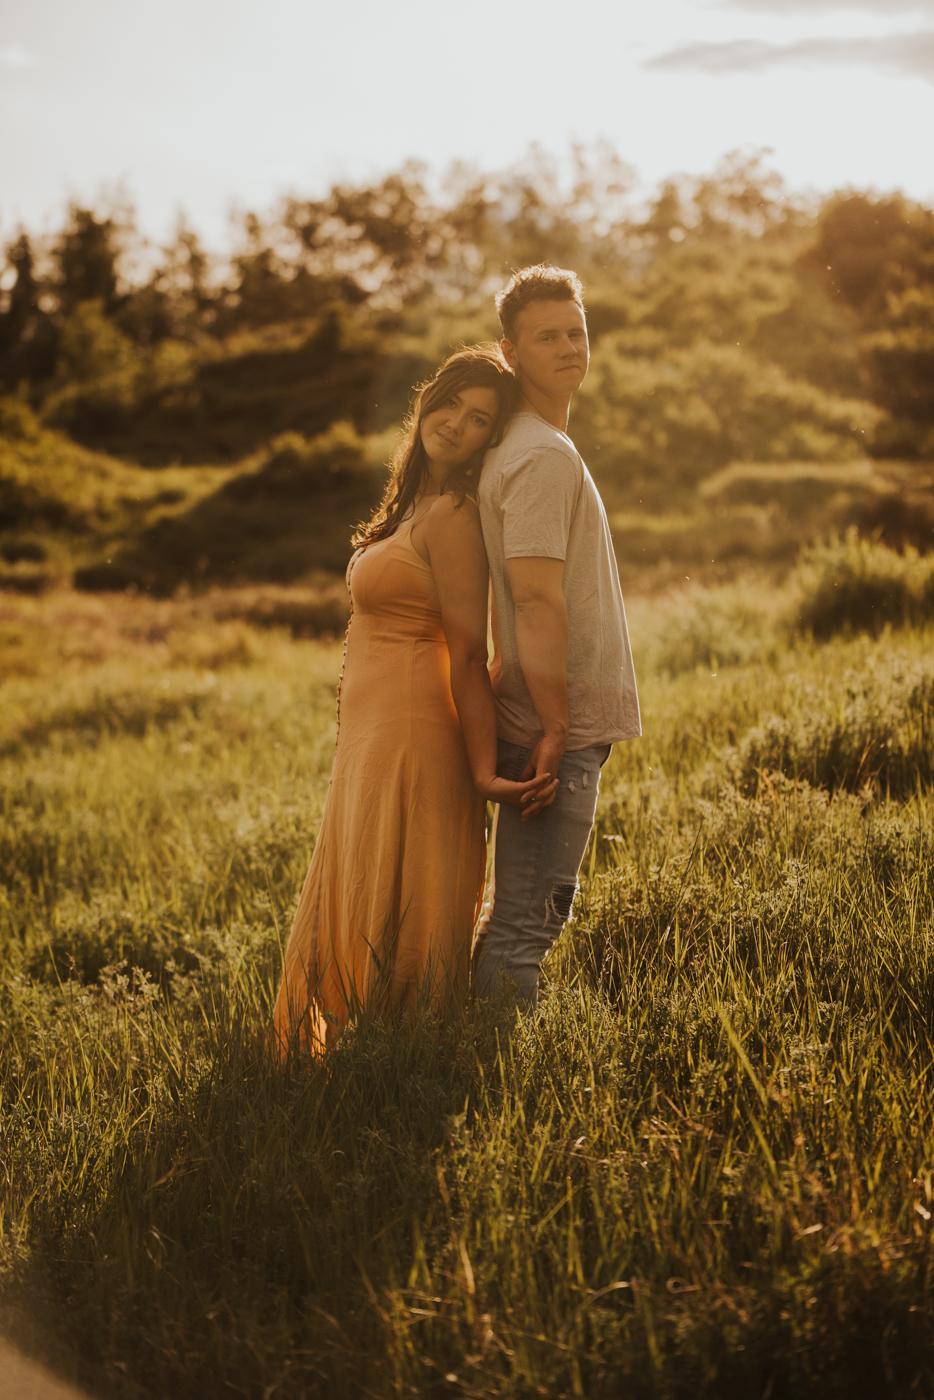 tyraephotography_photographer_wedding_elopement_engagement_photography-6205.jpg